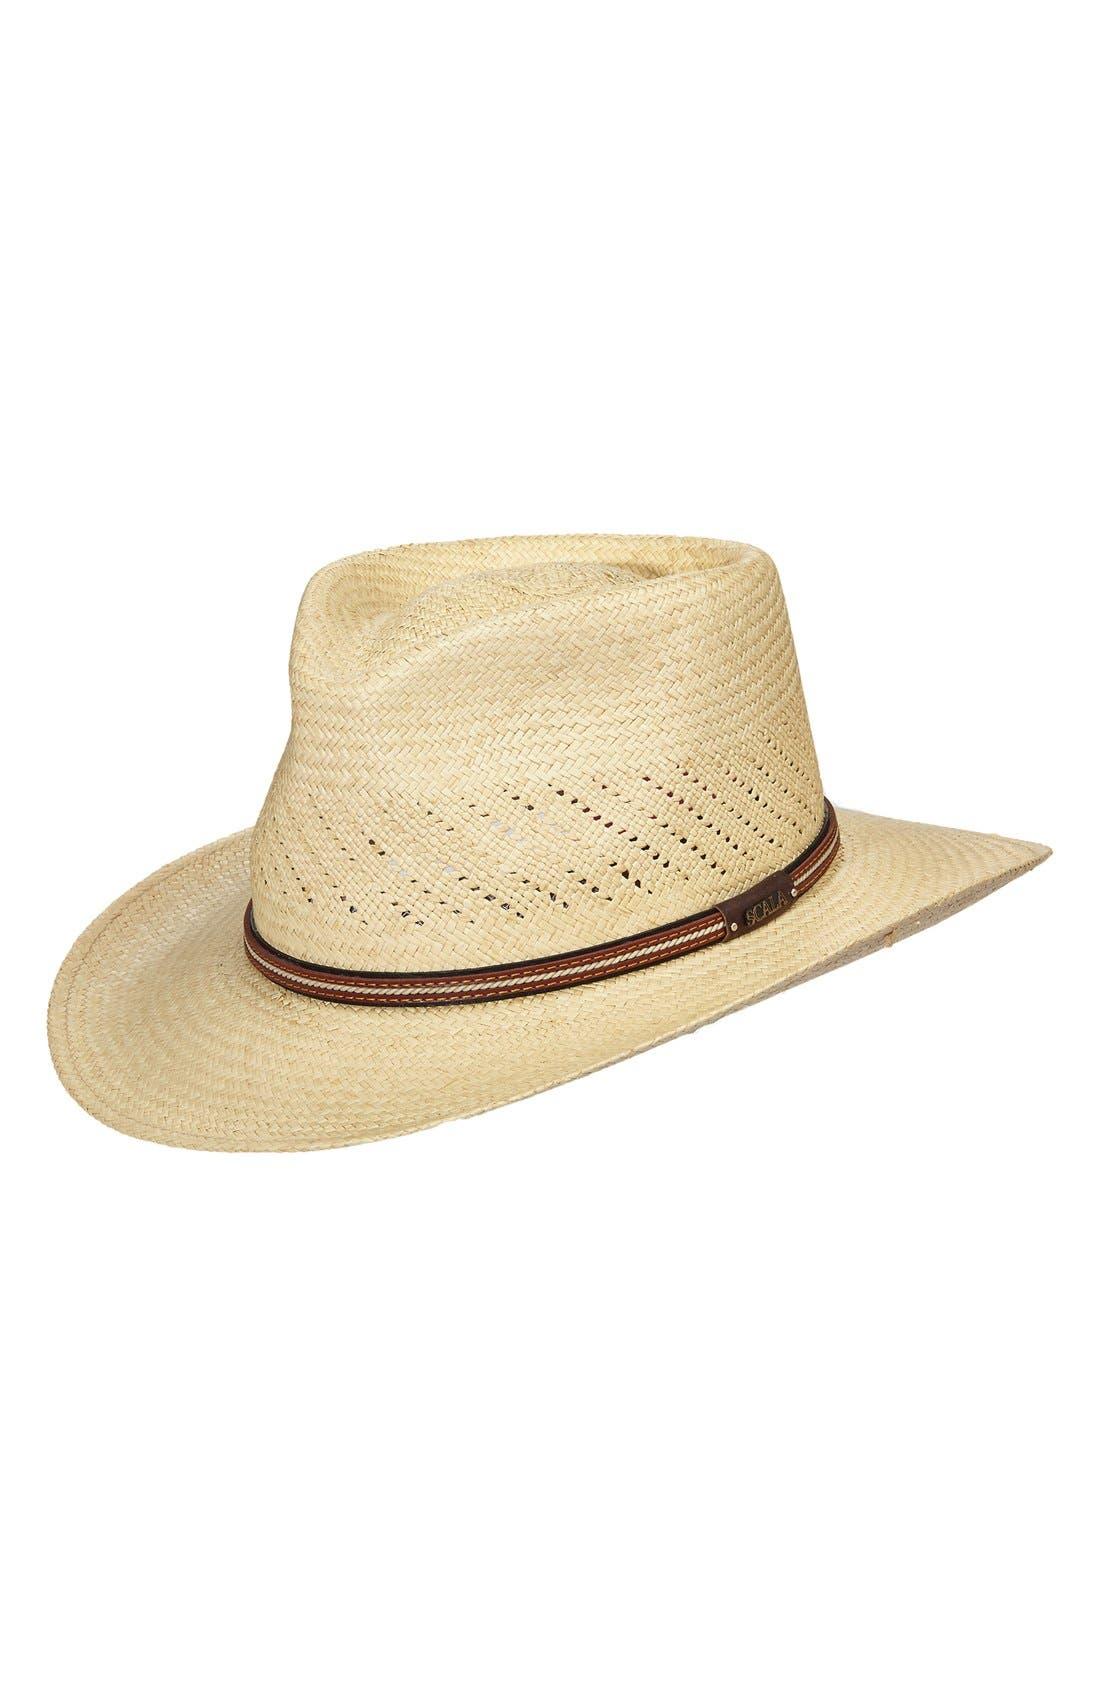 Main Image - Scala Straw Panama Hat